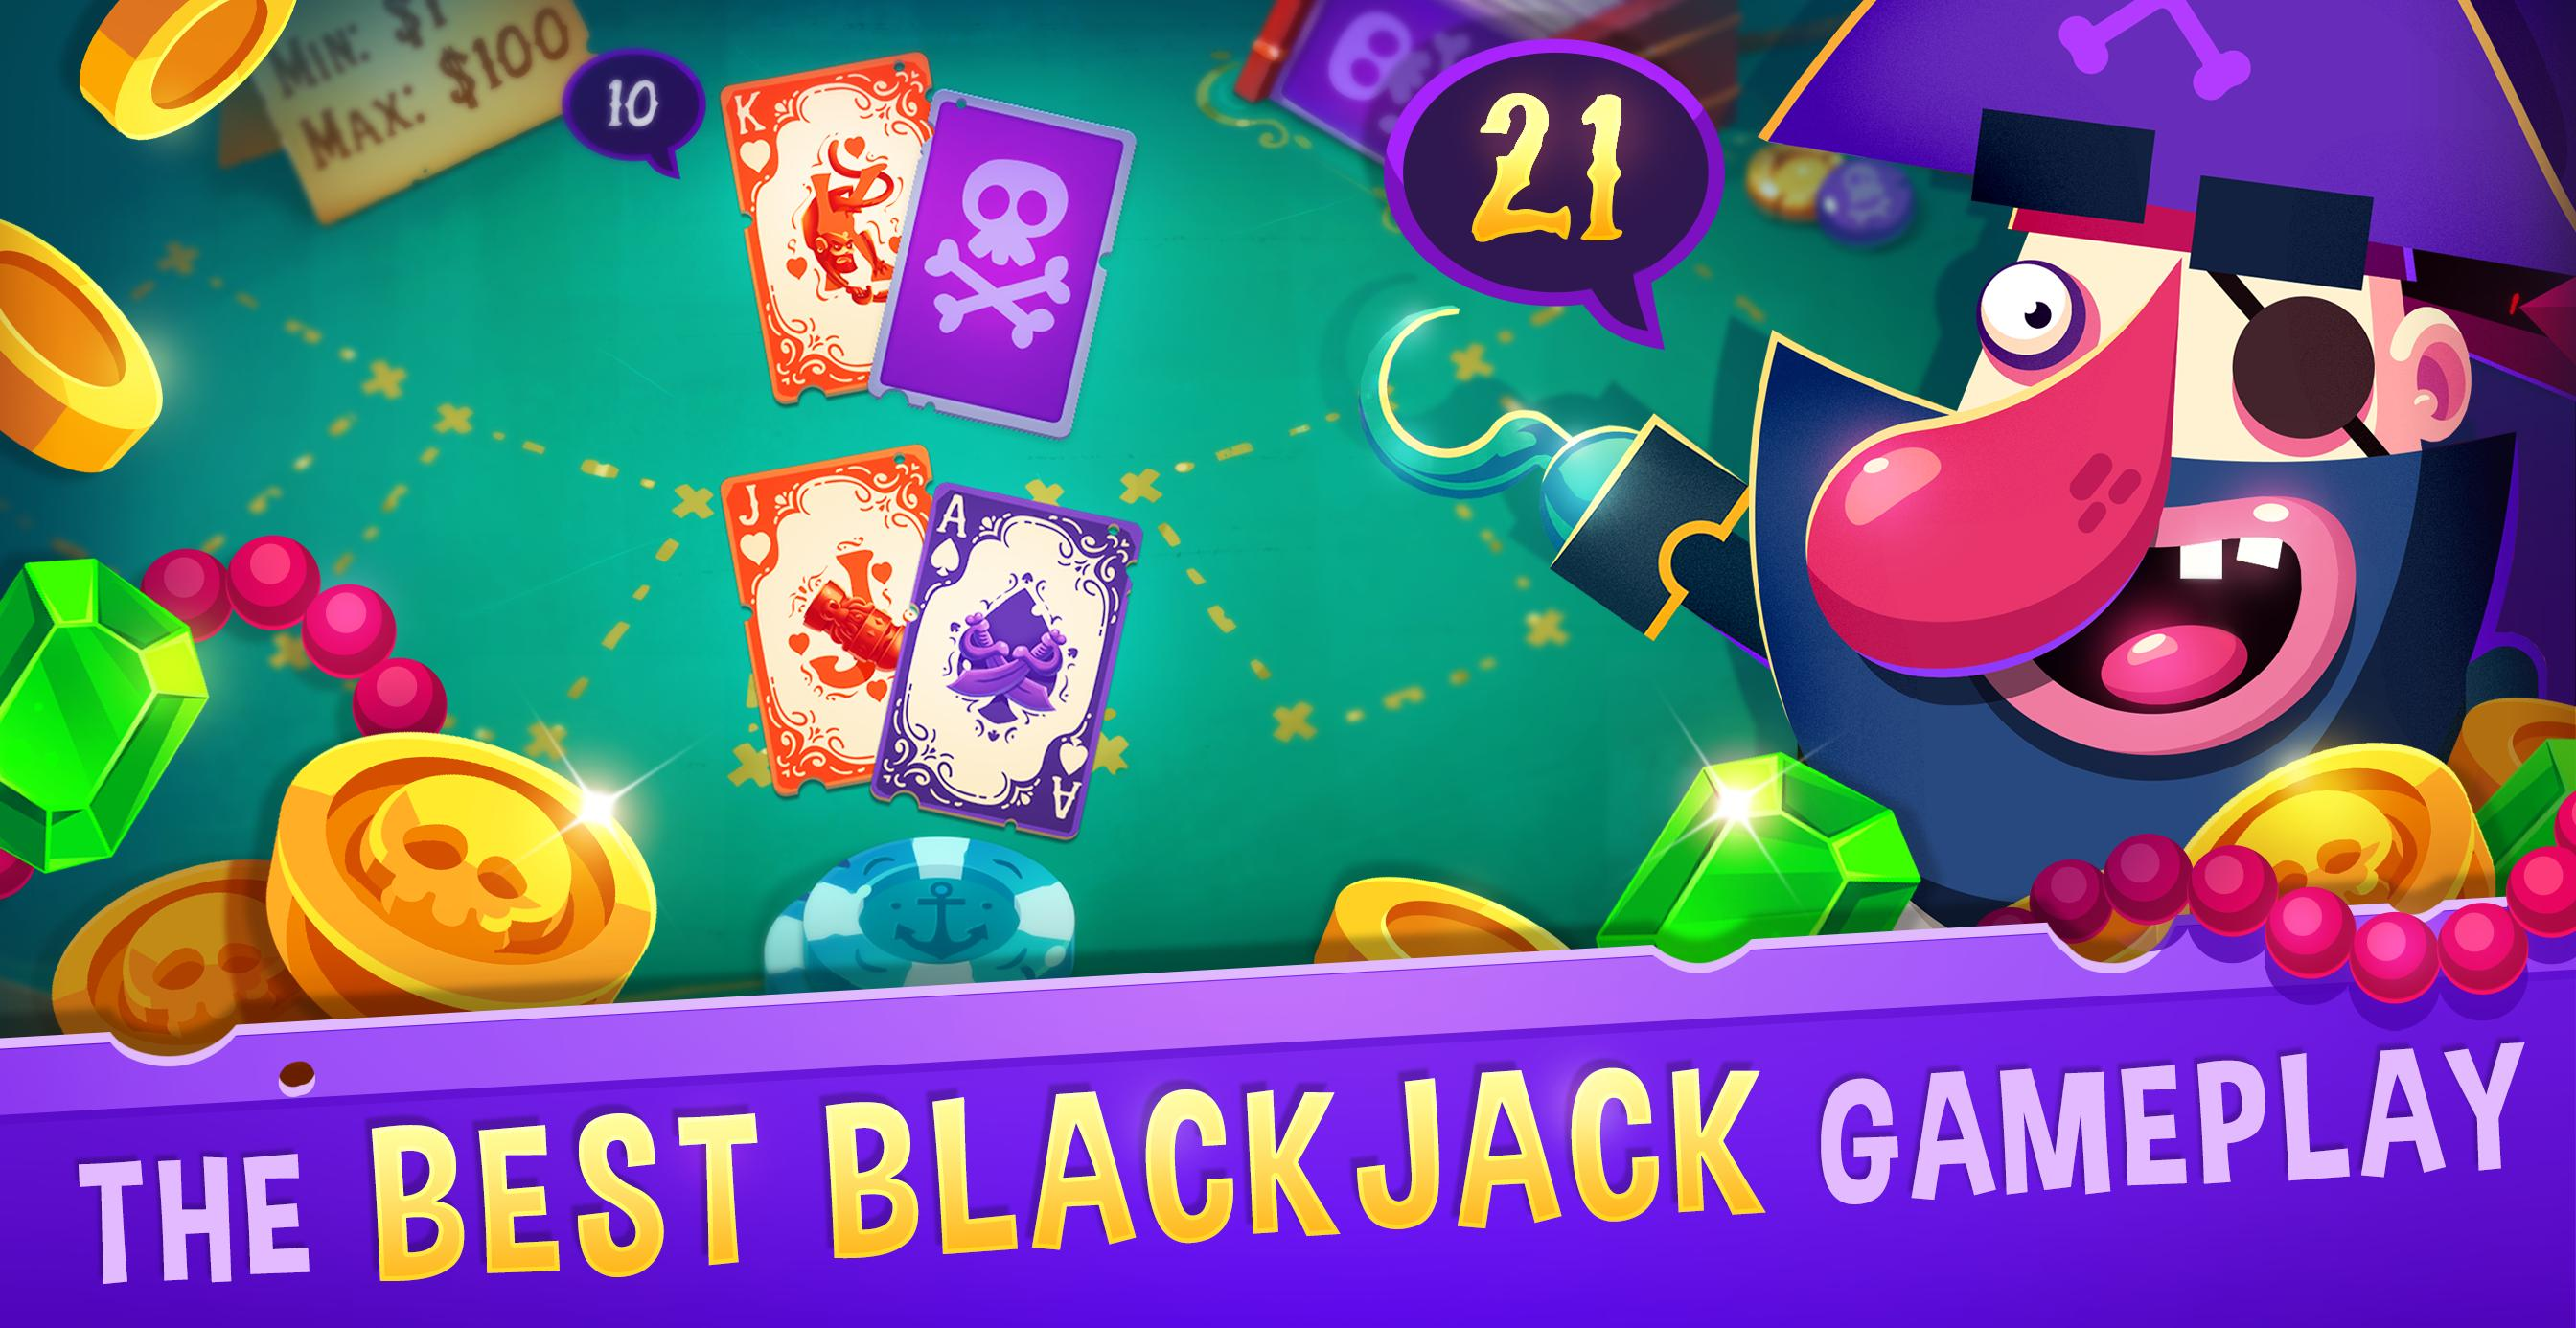 Blackjack 21 - Pirate Black Jack! Sangat Bisa Dimainkan Siapa Pun